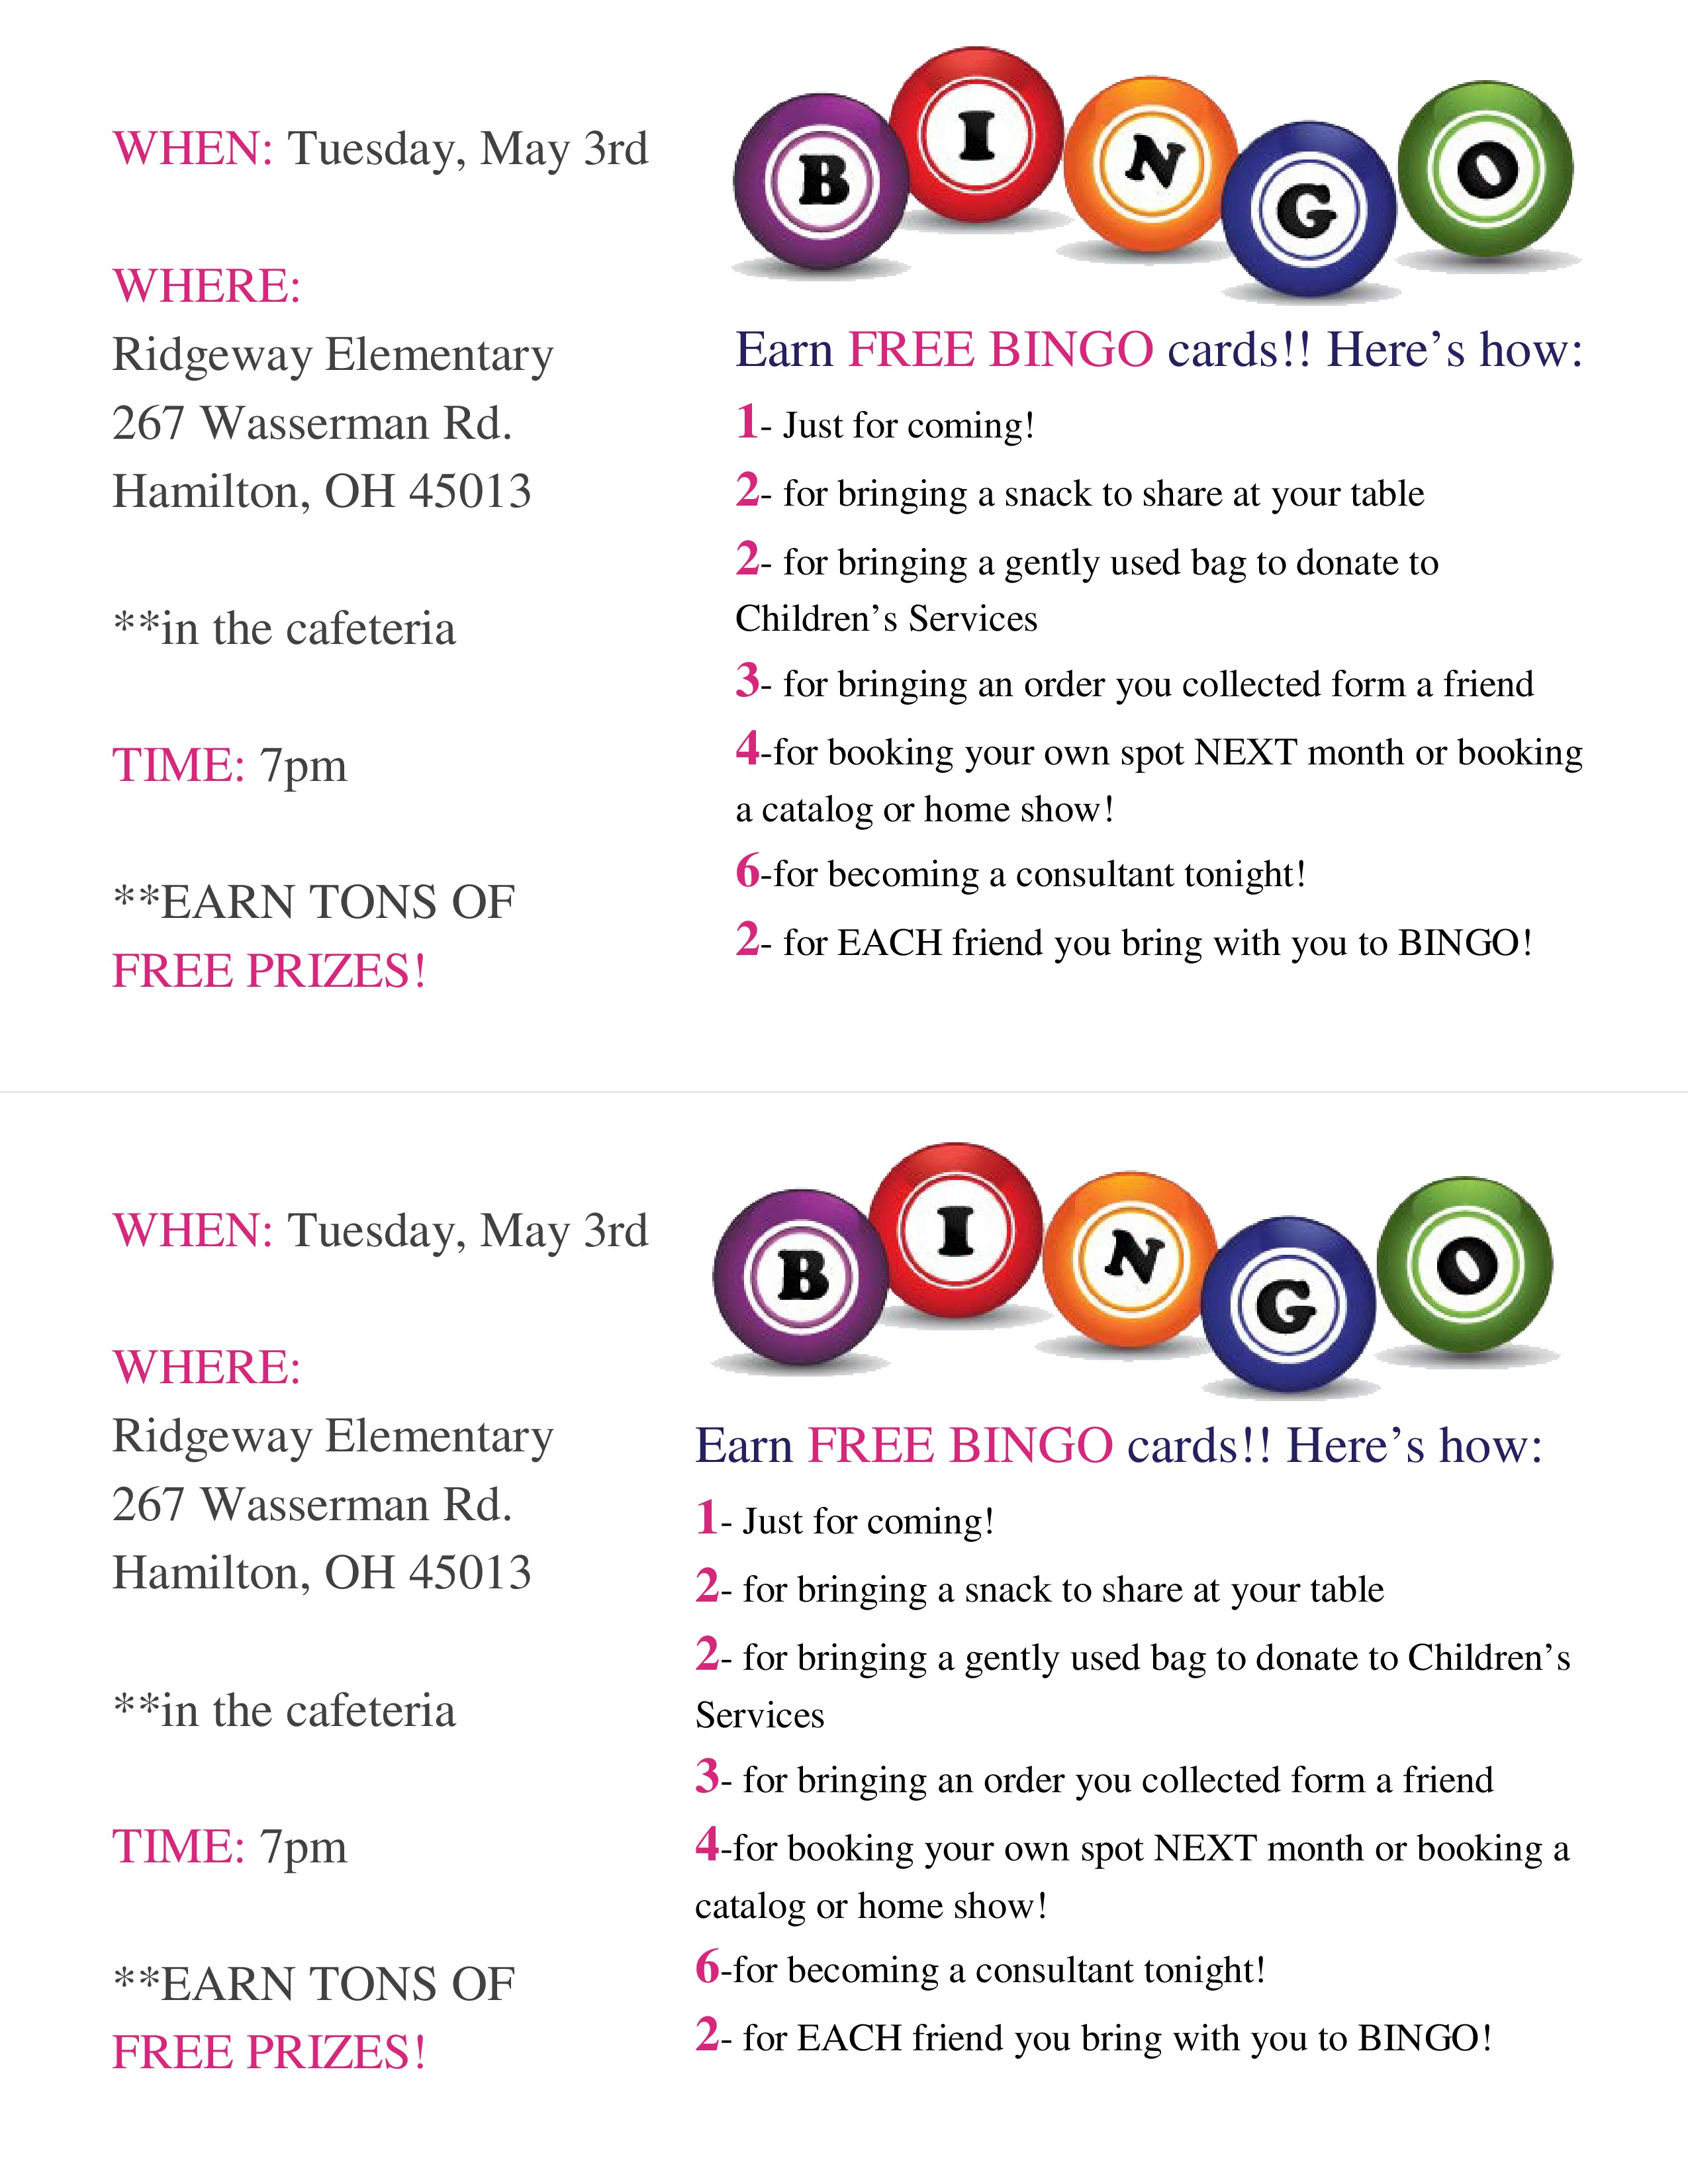 bingo invite 2016 page 0?w=705&h=912 thirty one bingo invitations & packets you can edit melissa fietsam,Thirty One Invitations